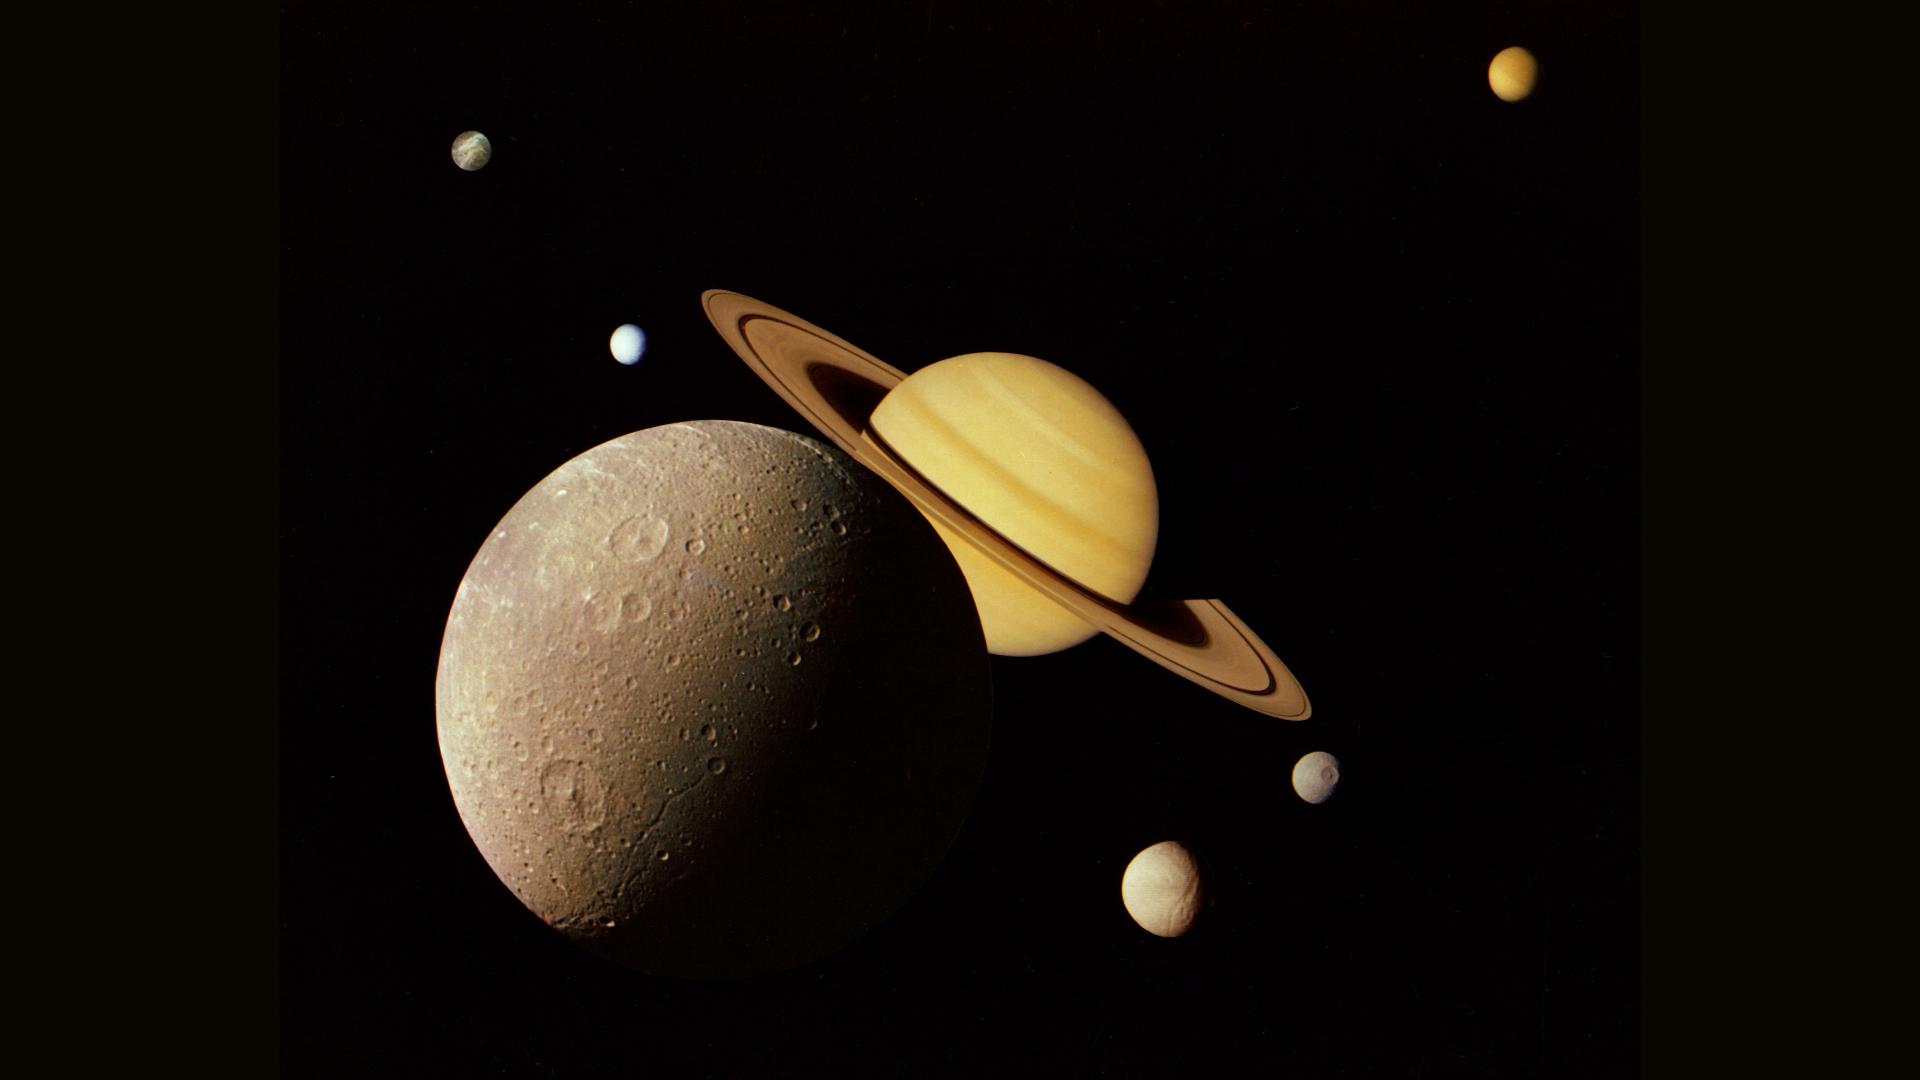 planet saturn information - 728×624